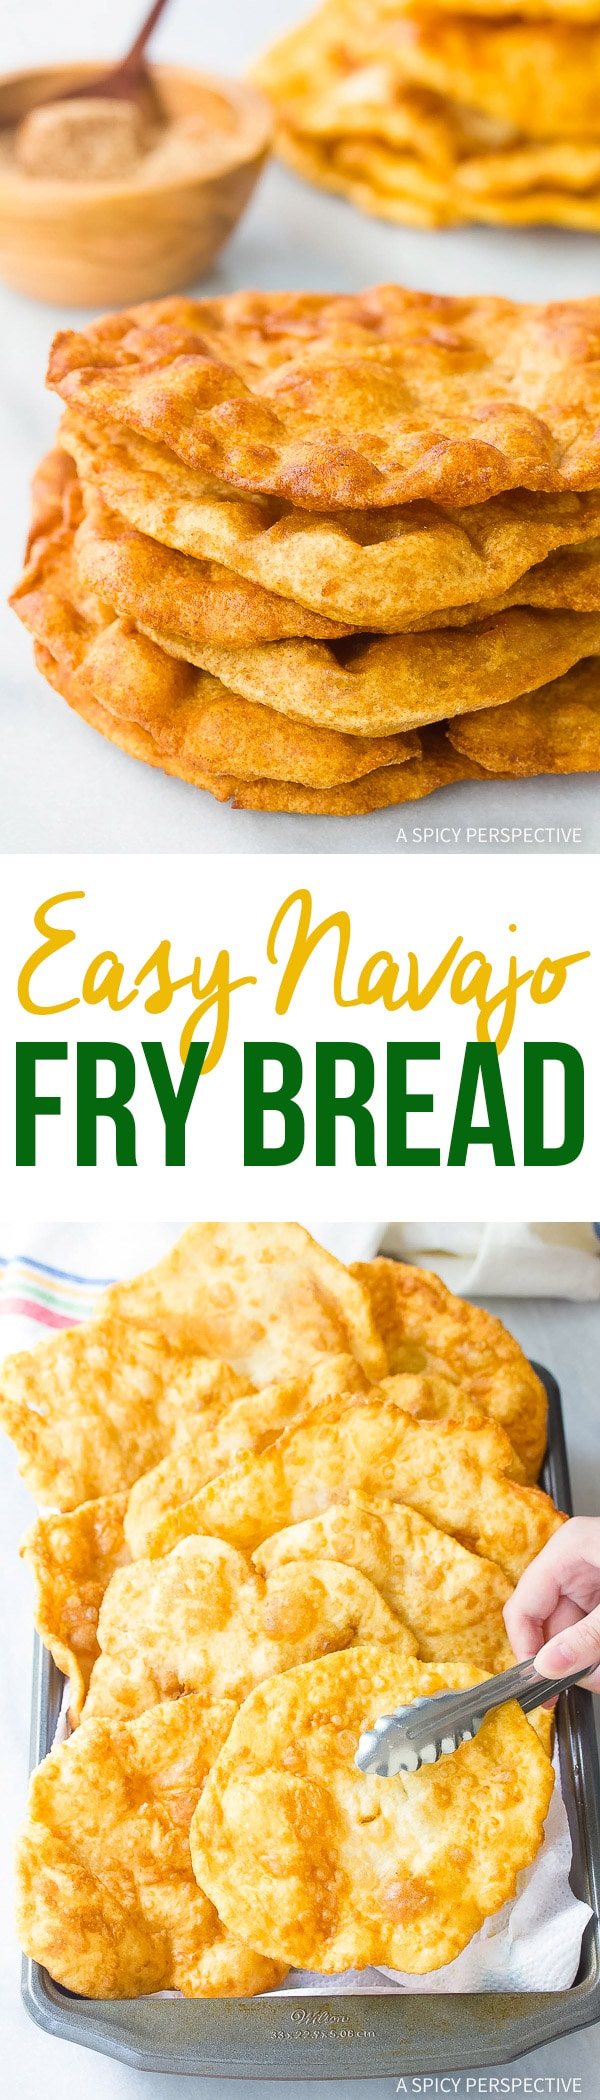 Easy Navajo Fry Bread Recipe - Sweet or savory!